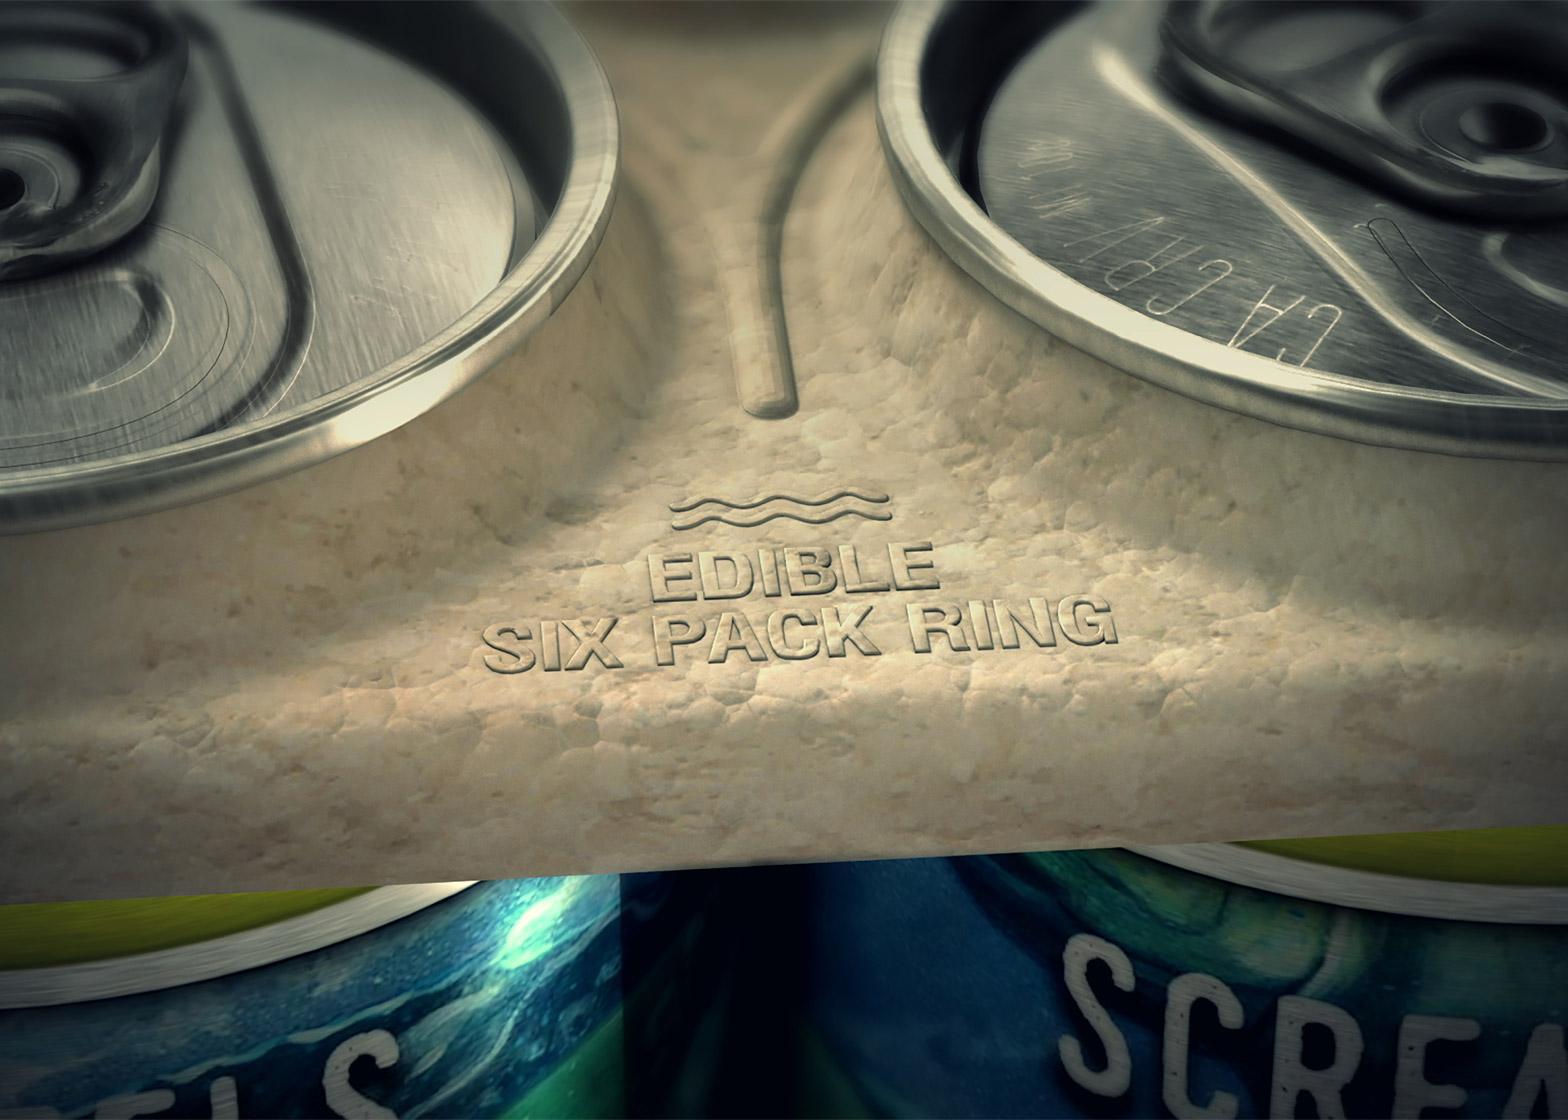 Edible six-pack rings by We Believers x Saltwater Brewery